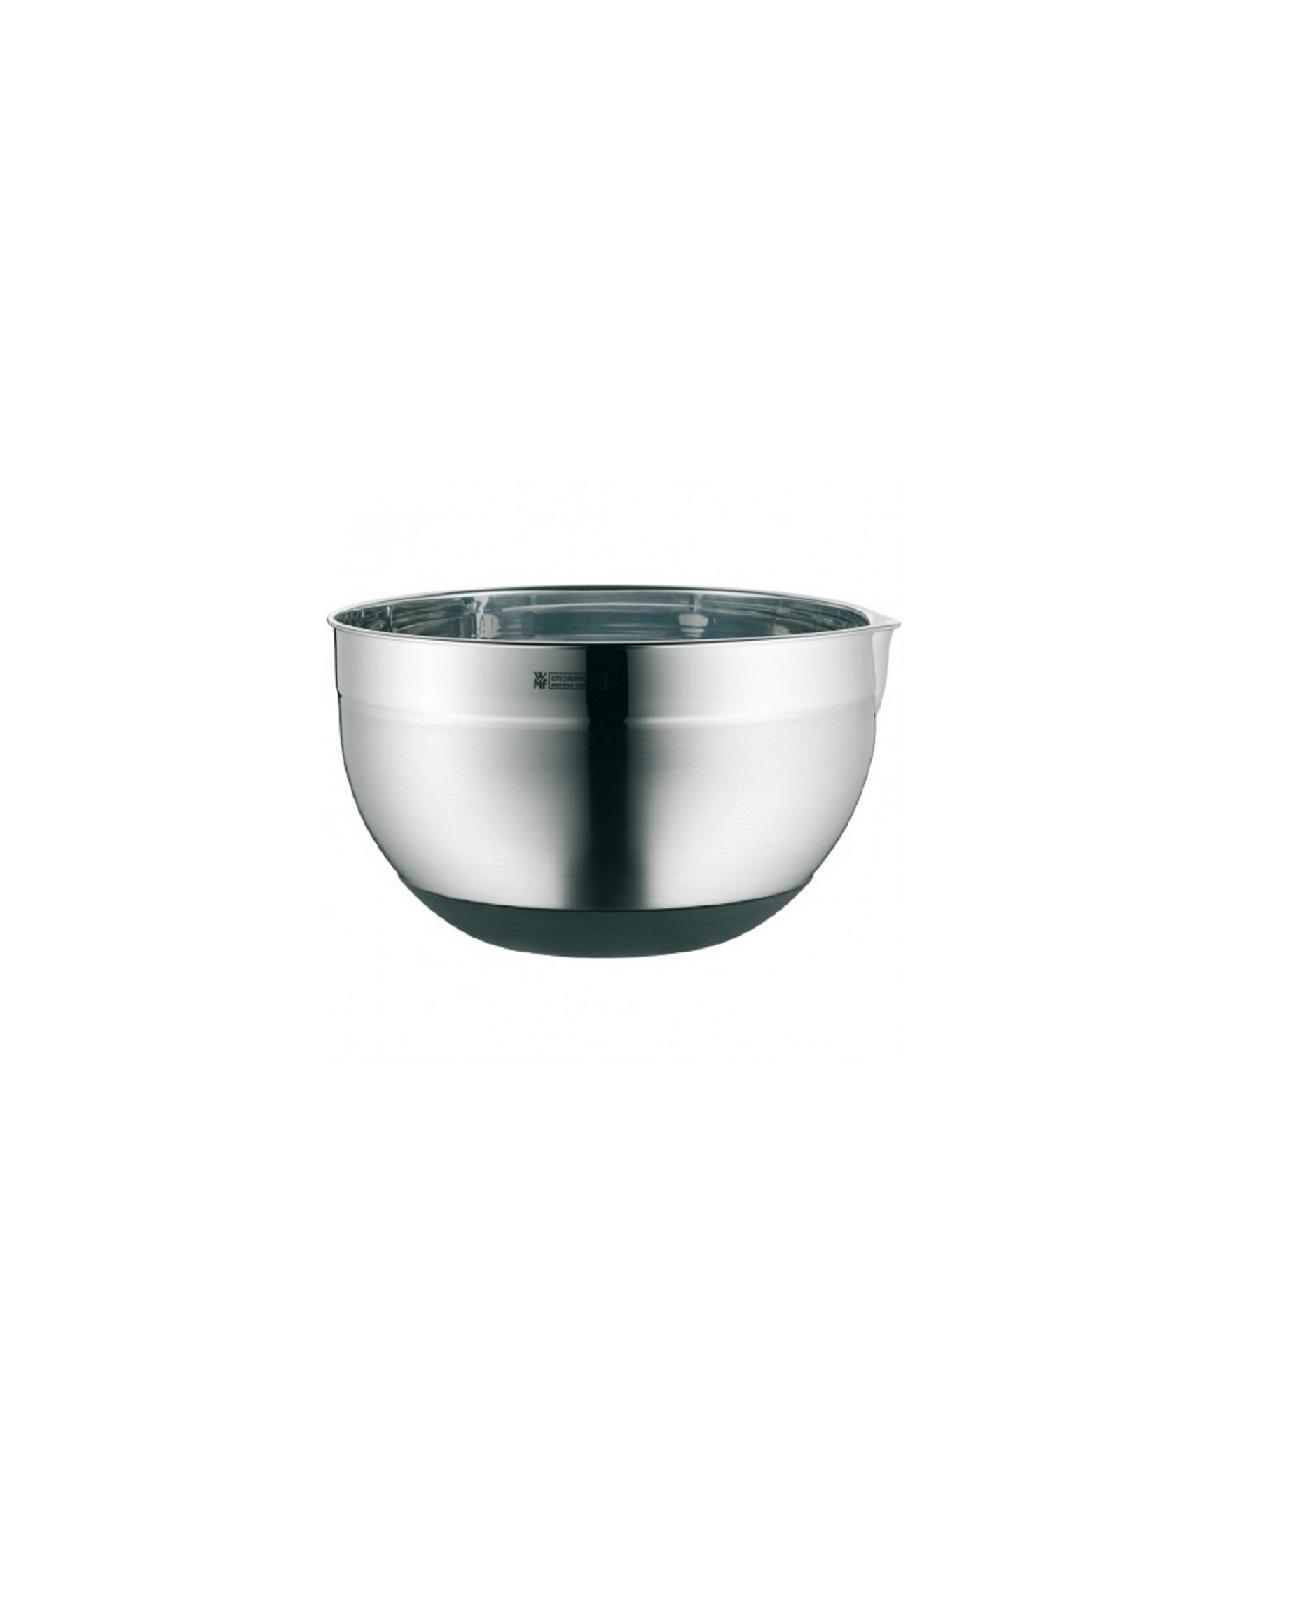 Миска WMF FOOD PREP AND STORAGE, диаметр 24 см, серебристый WMF 06 4660 6030 фото 1